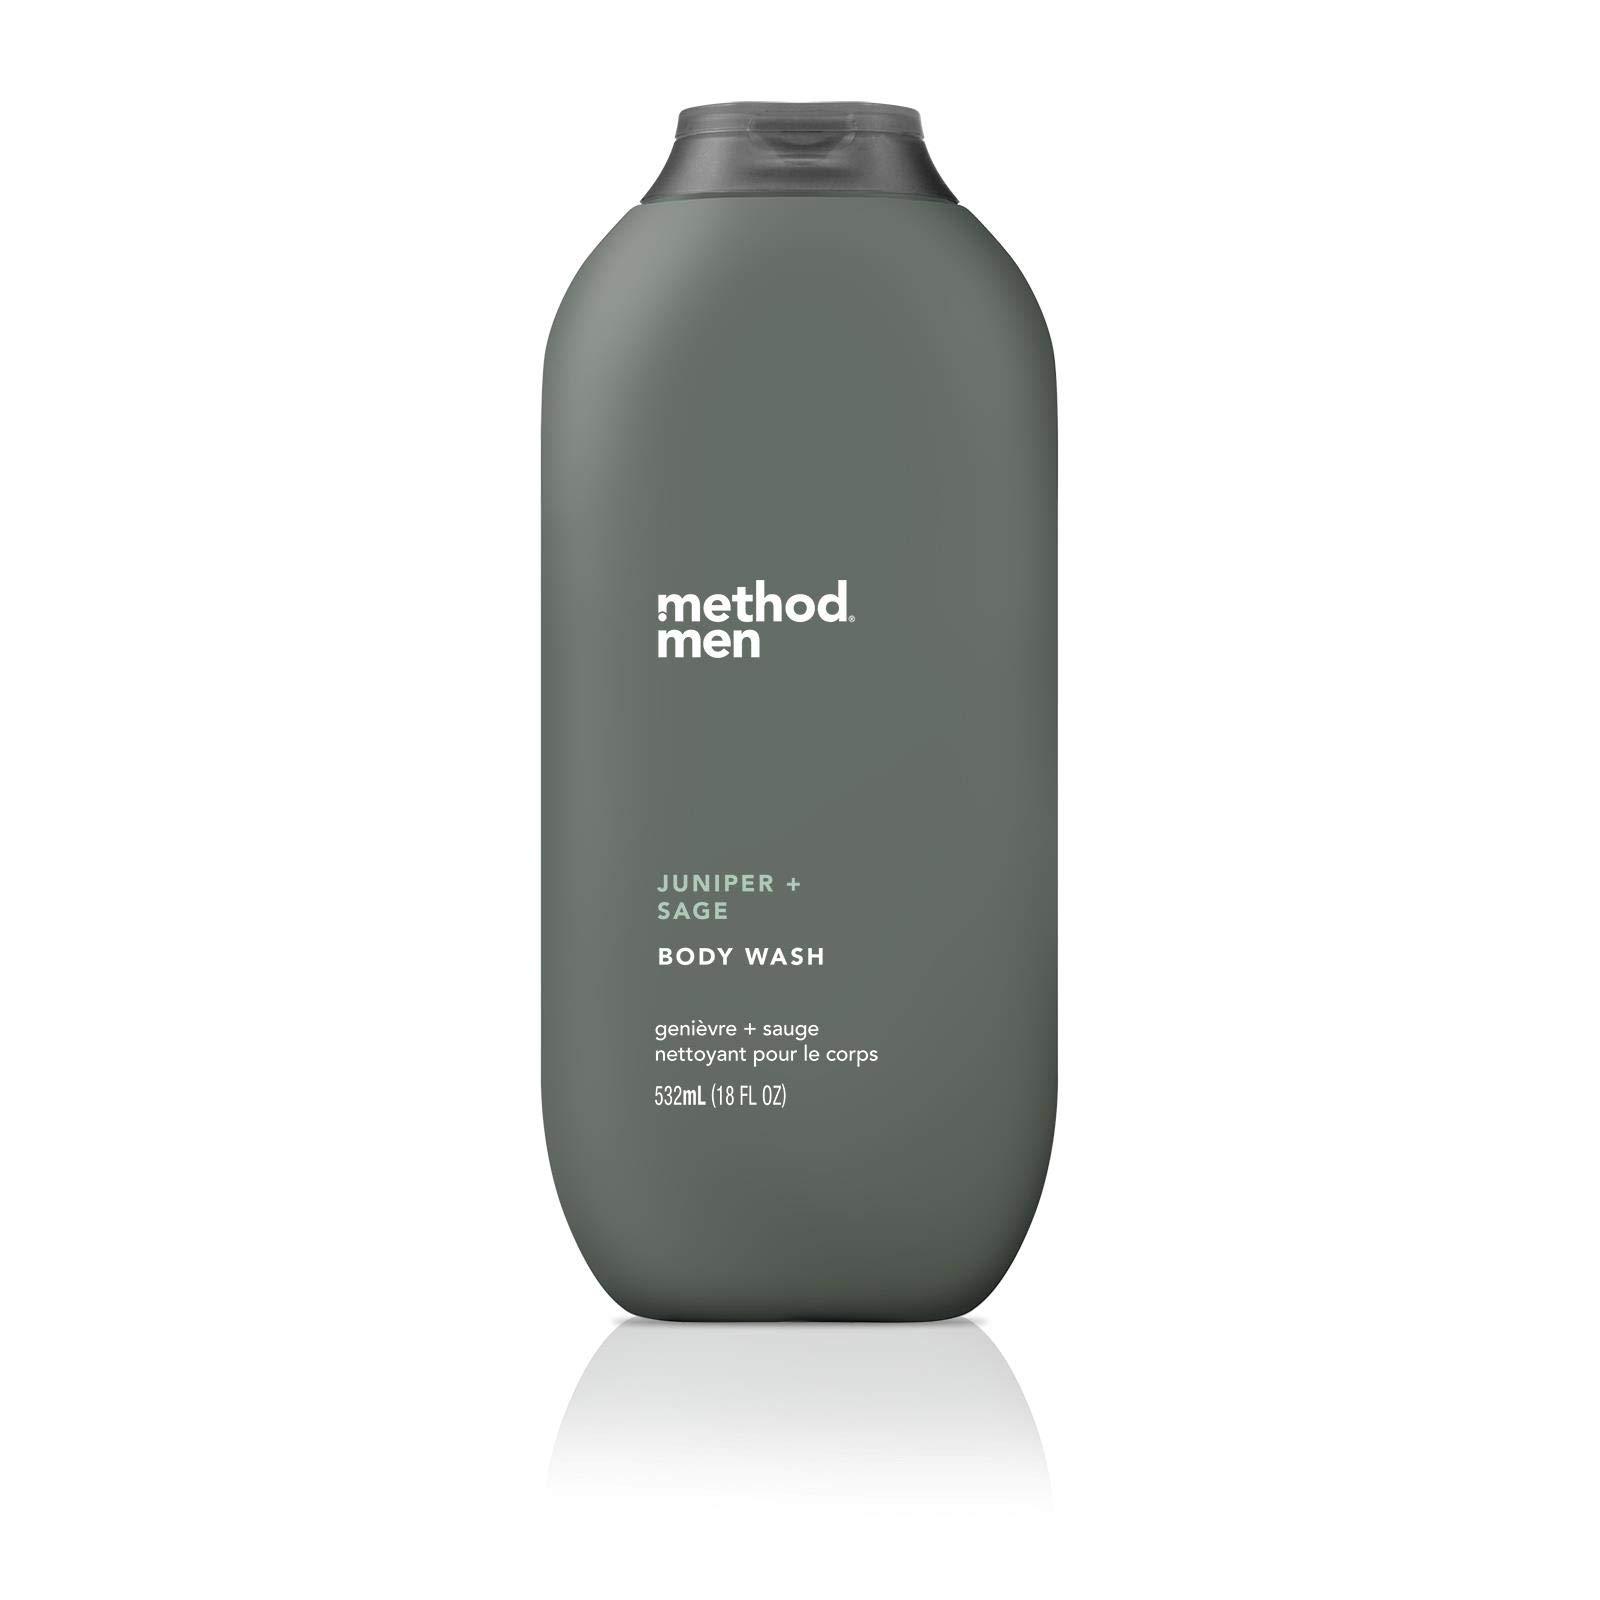 Method Men, Body Wash, Juniper + Sage, 18 fl oz (532 ml)